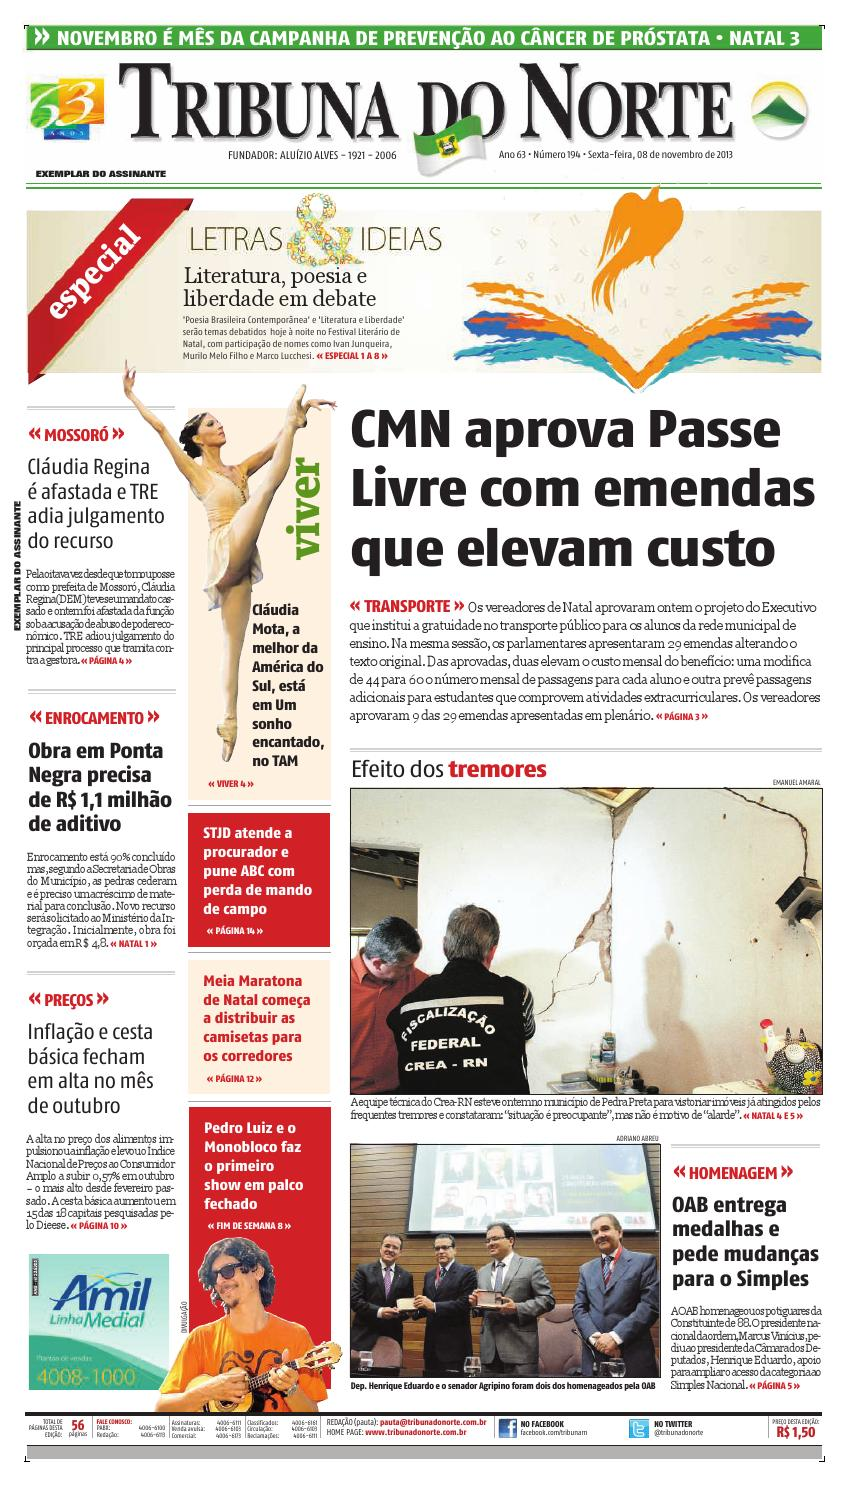 Tribuna do Norte - 08 11 2013 by Empresa Jornalística Tribuna do Norte Ltda  - issuu 7116f23ae39a7